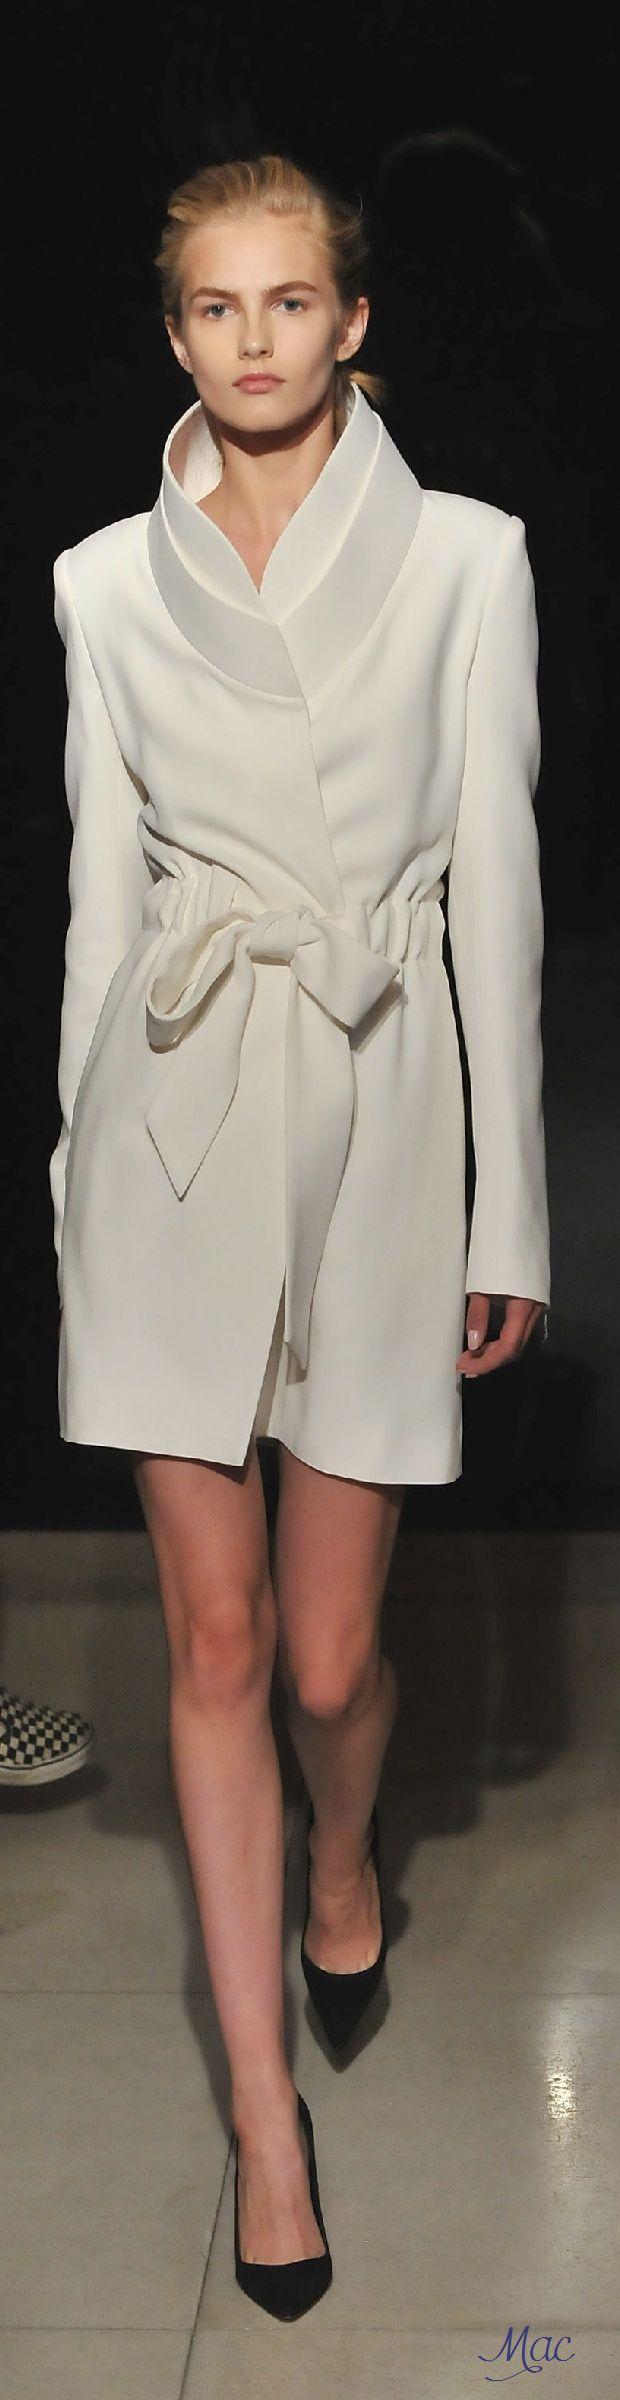 Spring 2016 Ready-to-Wear Brandon Maxwell Требуются эротические модели для…